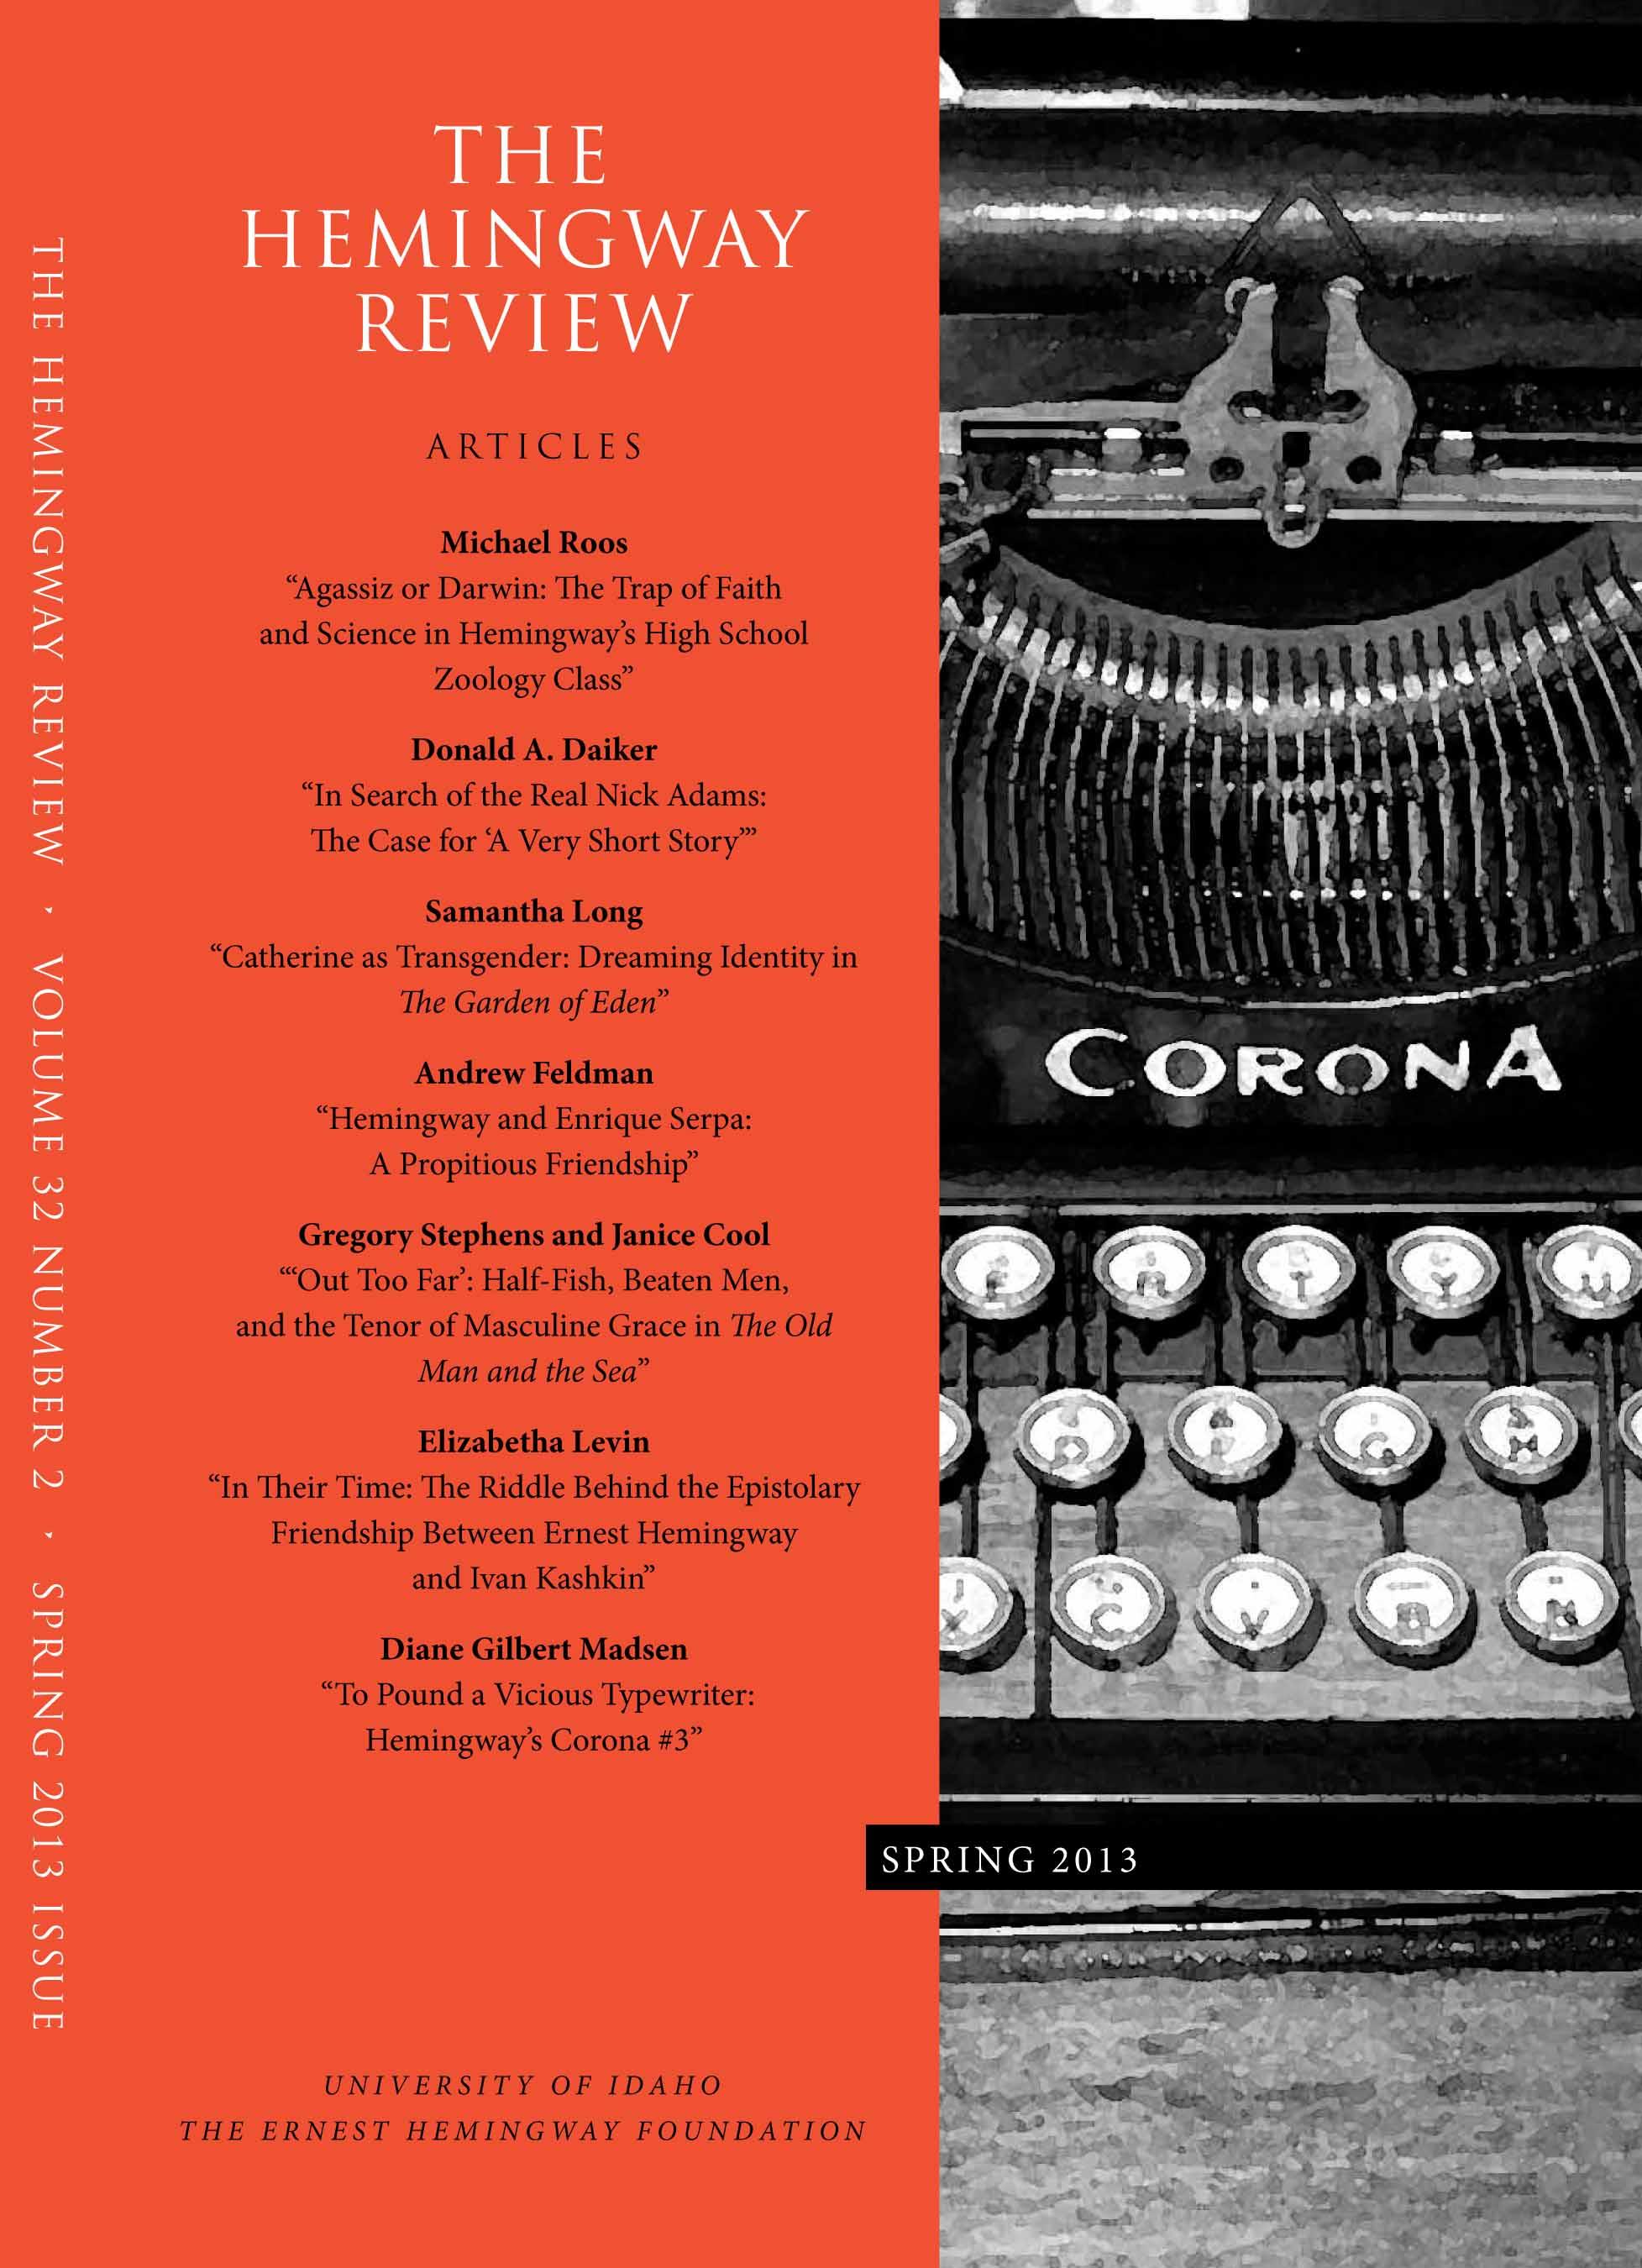 Hemingway Review Spring 2013